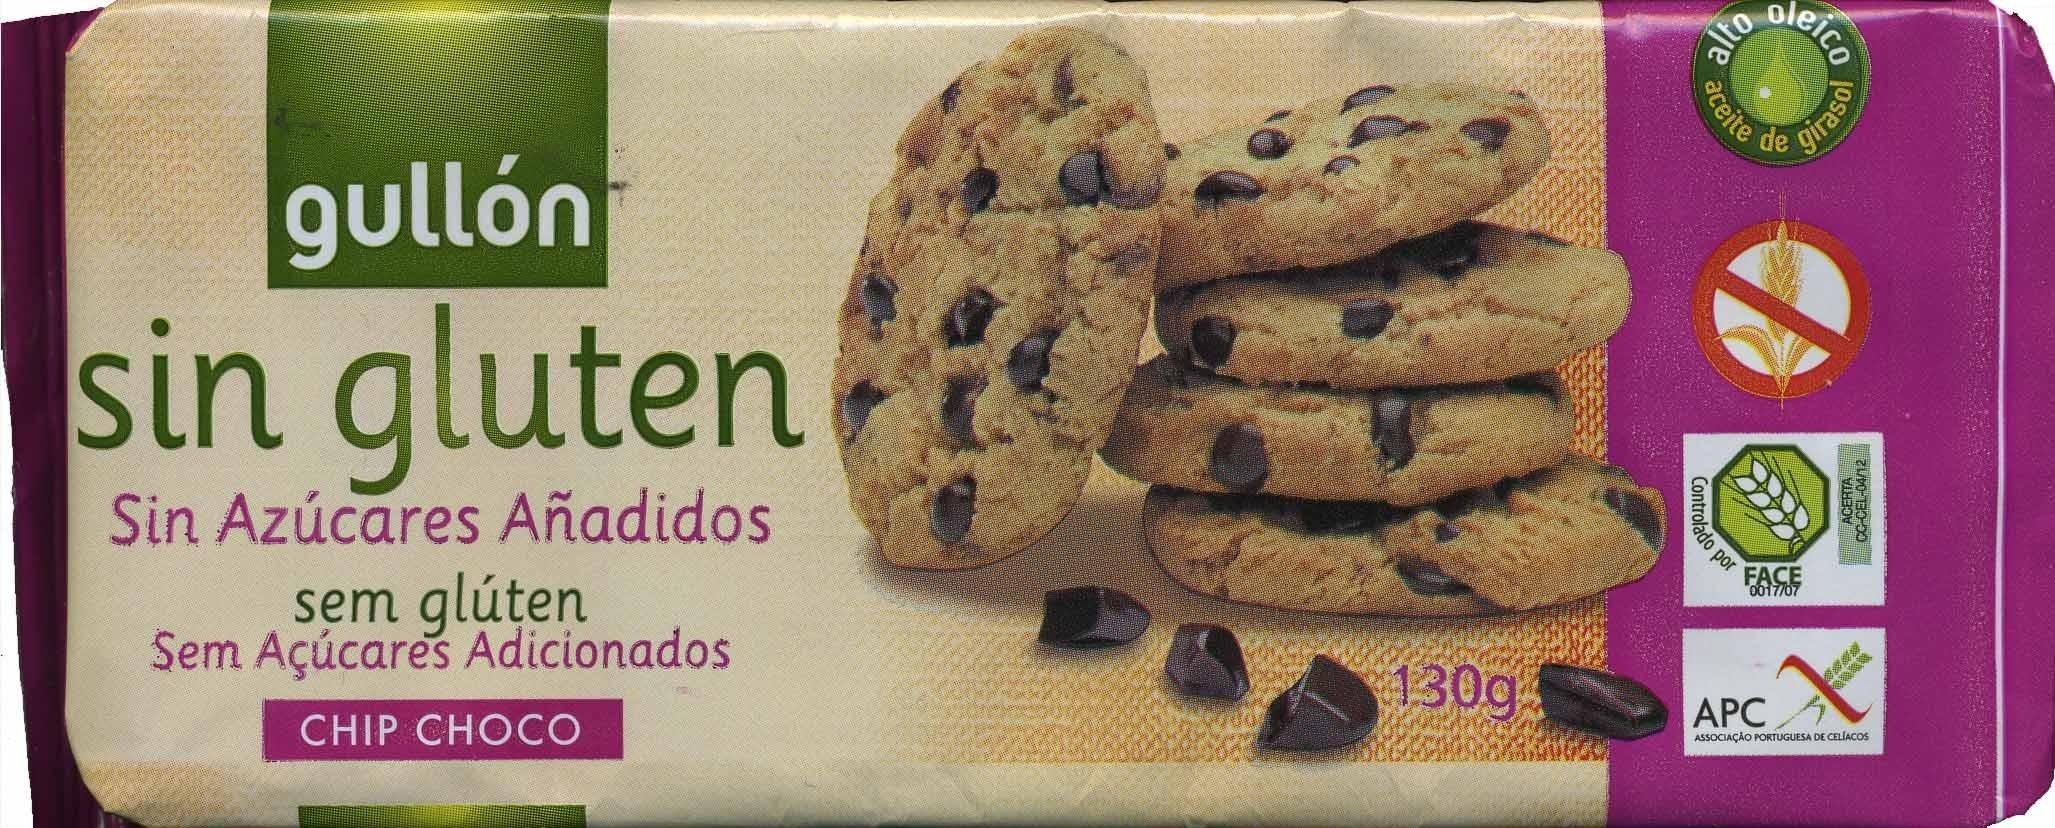 Cookies sin glúten sin azúcares añadidos - Producte